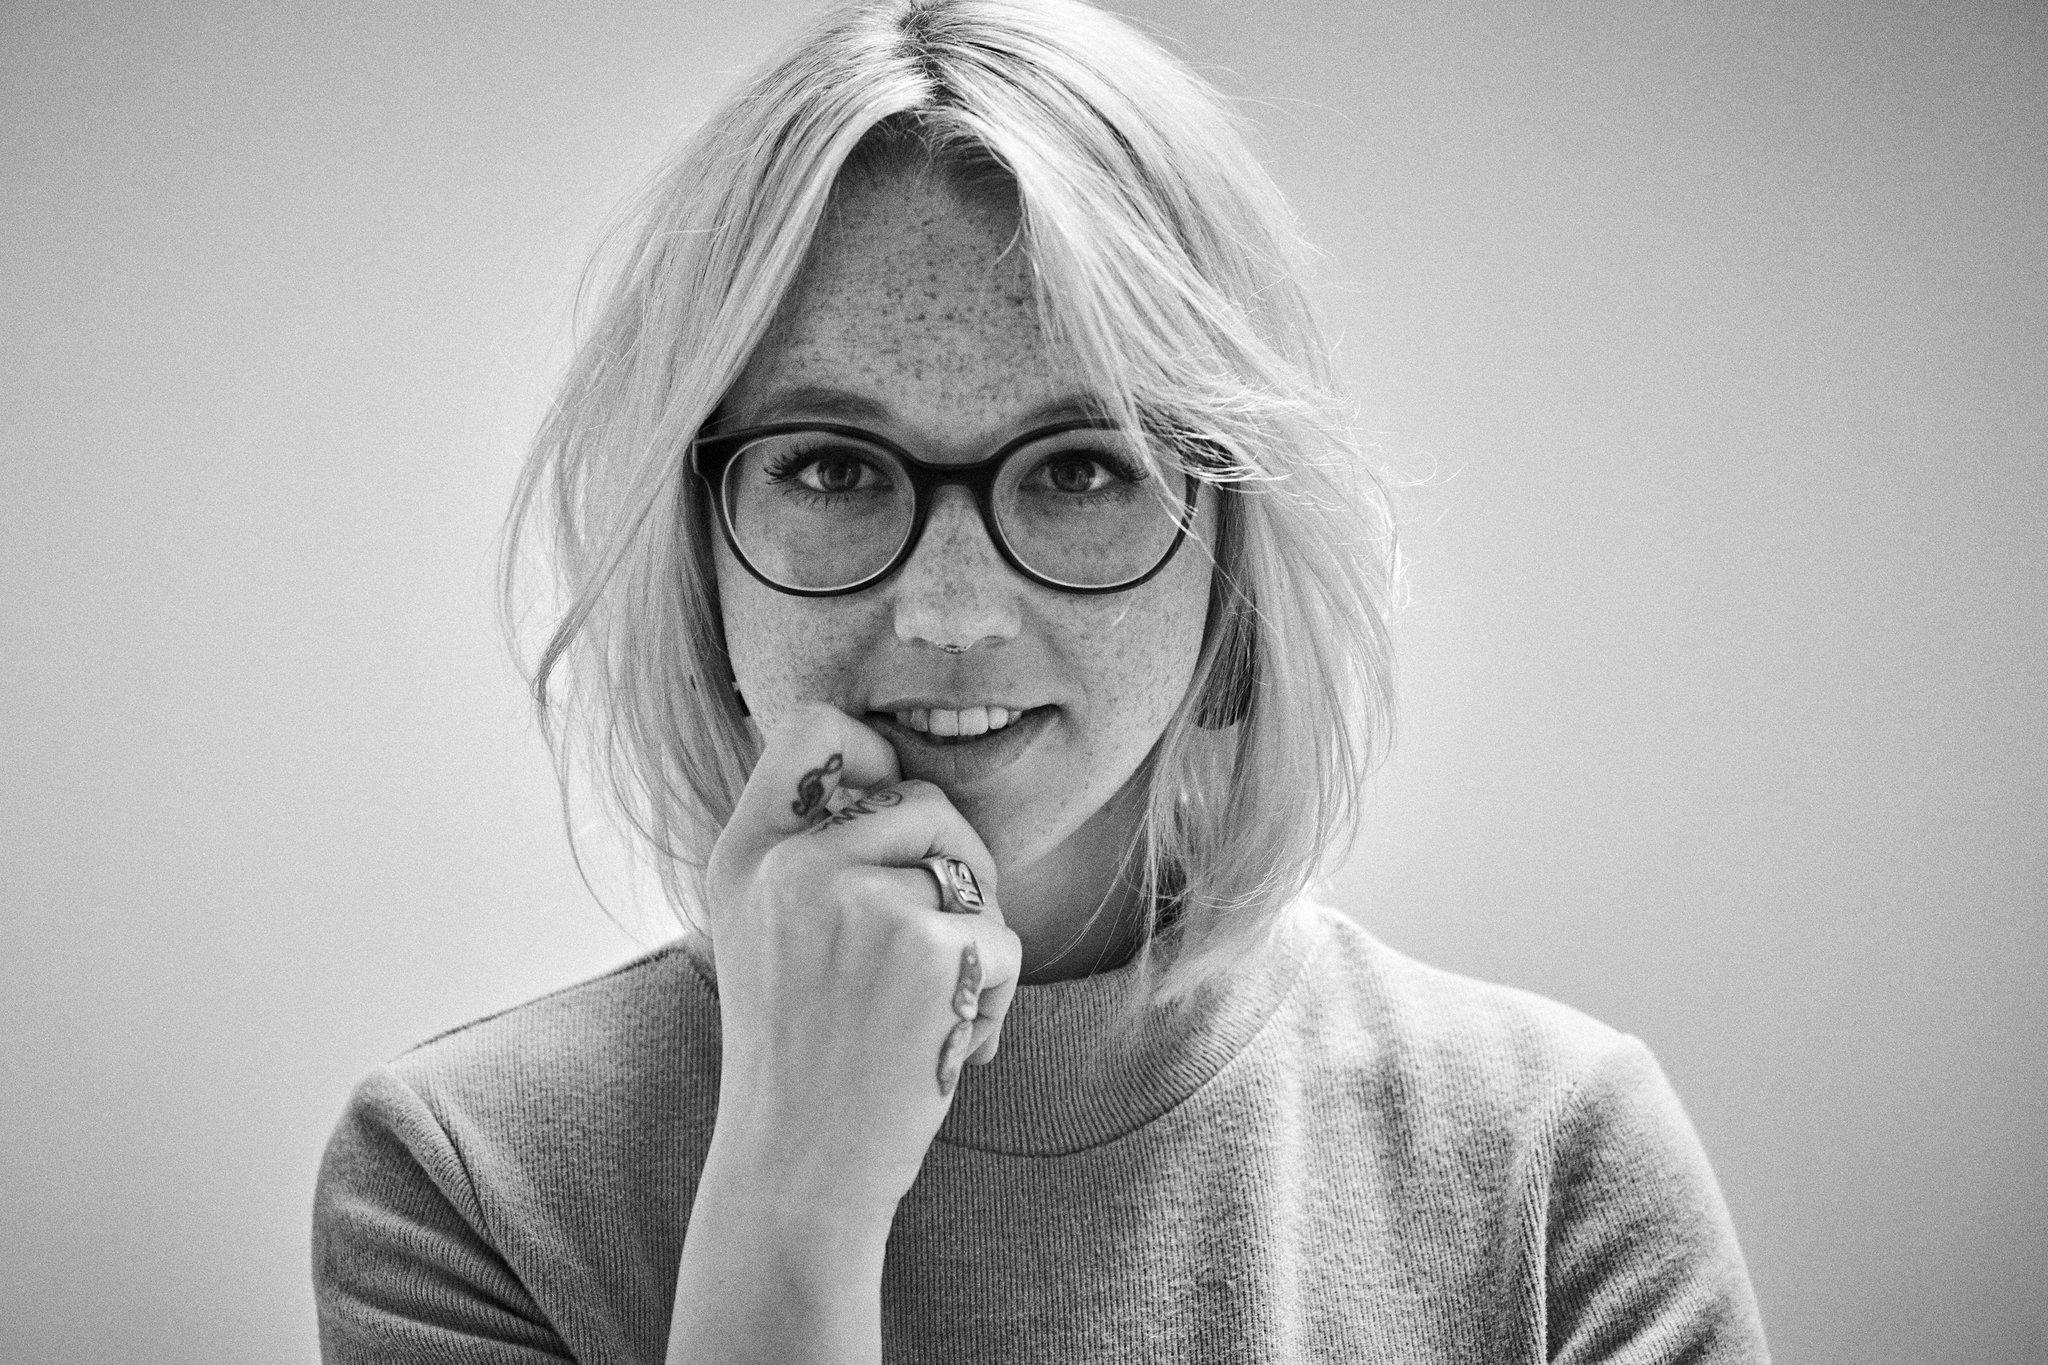 Stefanie Heinzmann Krebs